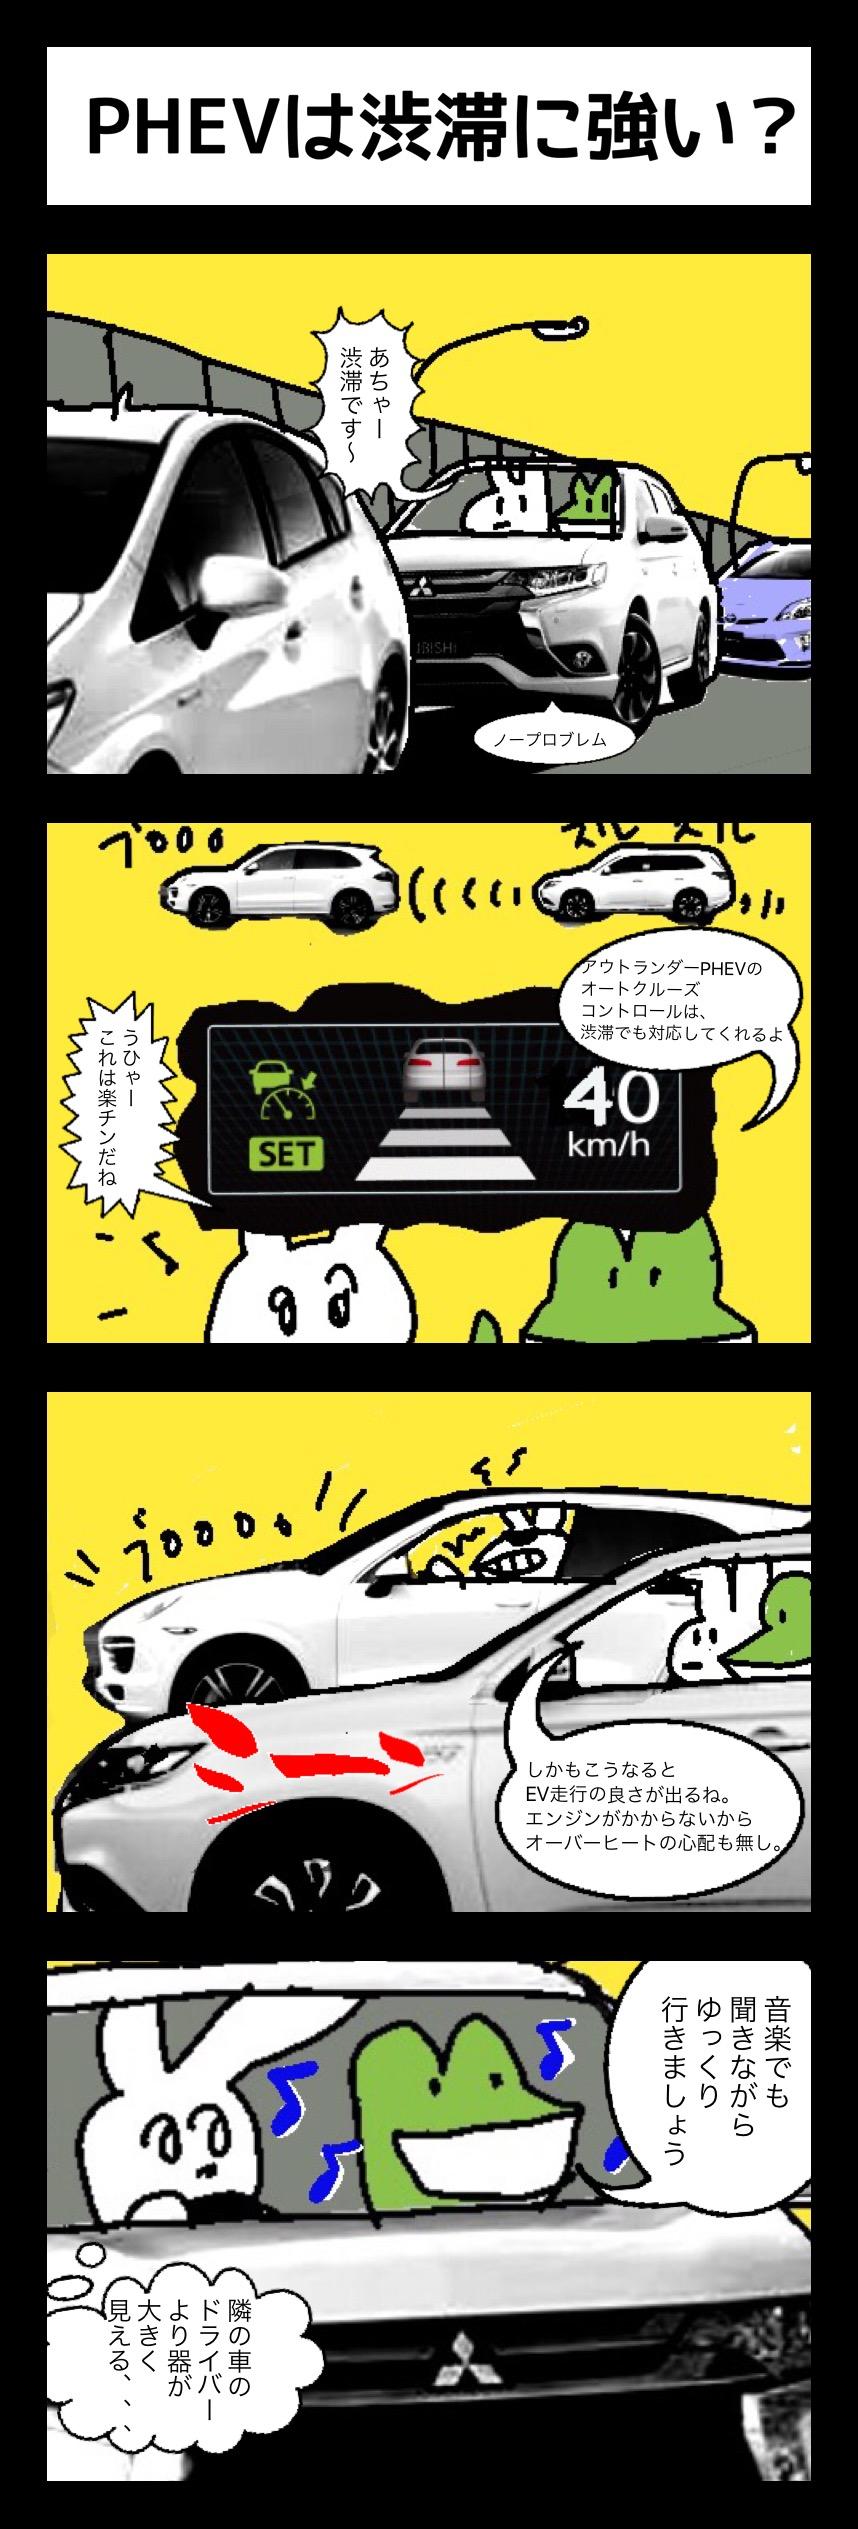 PHEV鳥獣戯画 その36「PHEVは渋滞に強い?」